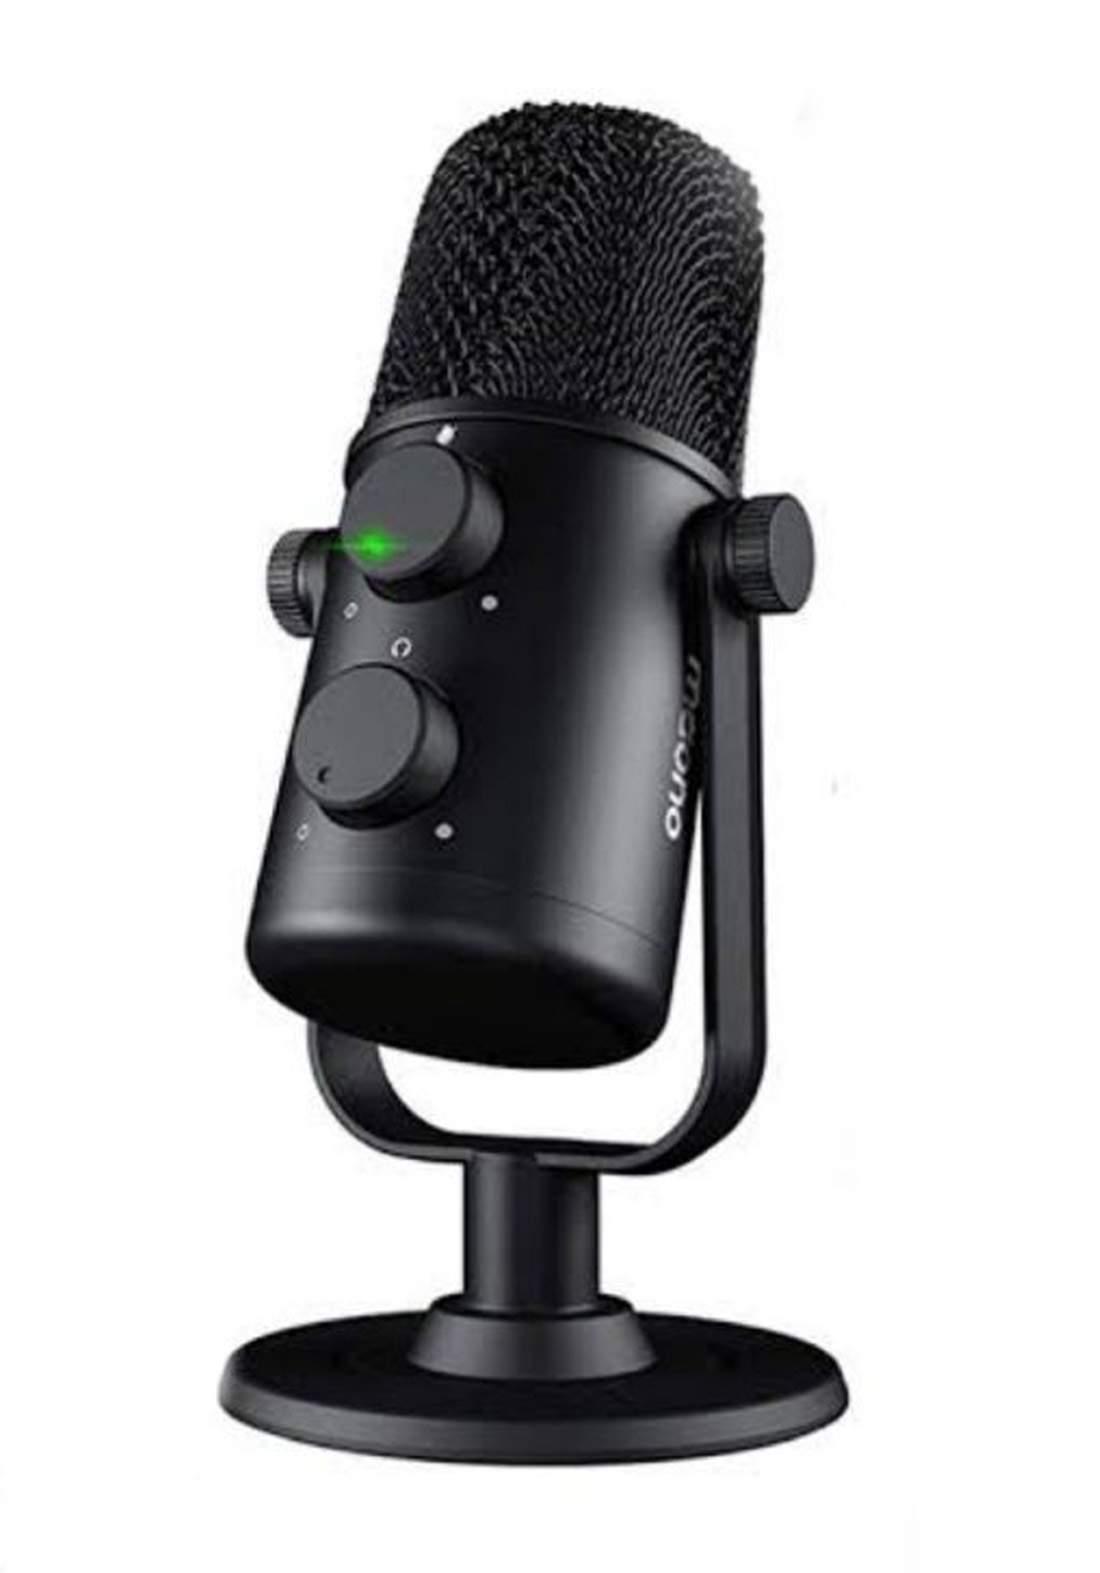 Maono AU-902 Fairy Lite USB Condenser Microphone - Black  مايكروفون